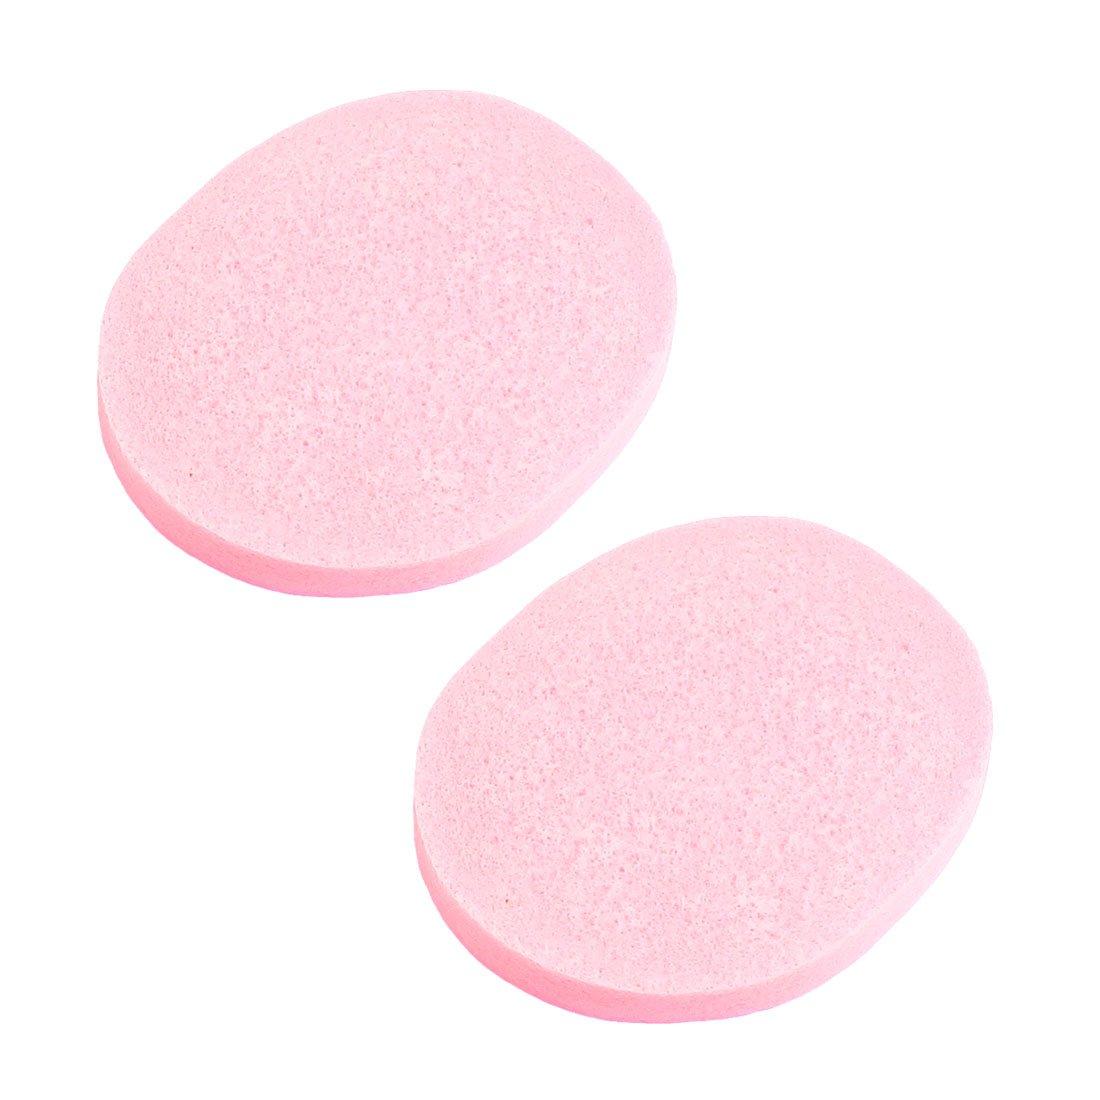 UESH 2 Pcs Practical Cosmetic Oval Pink Sponge Facial Washing Cleansing Pads(China (Mainland))